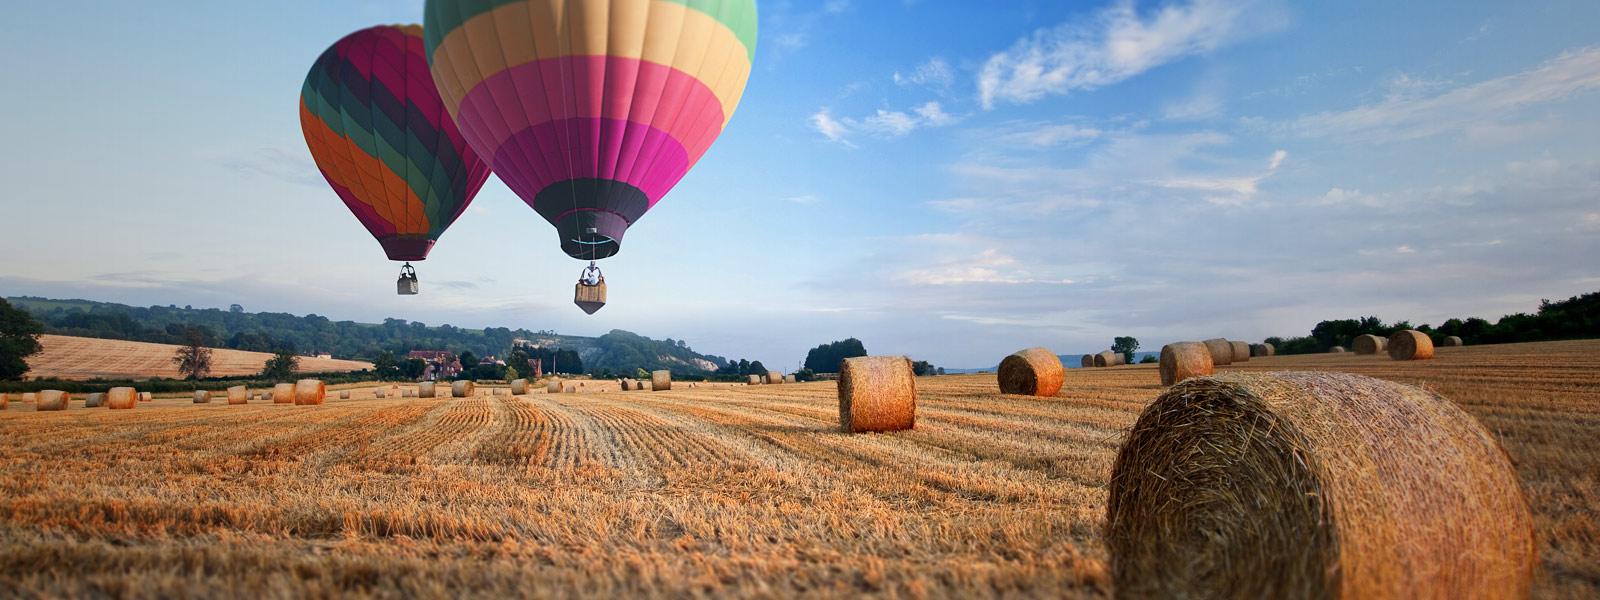 Hostwith Slider Balloons